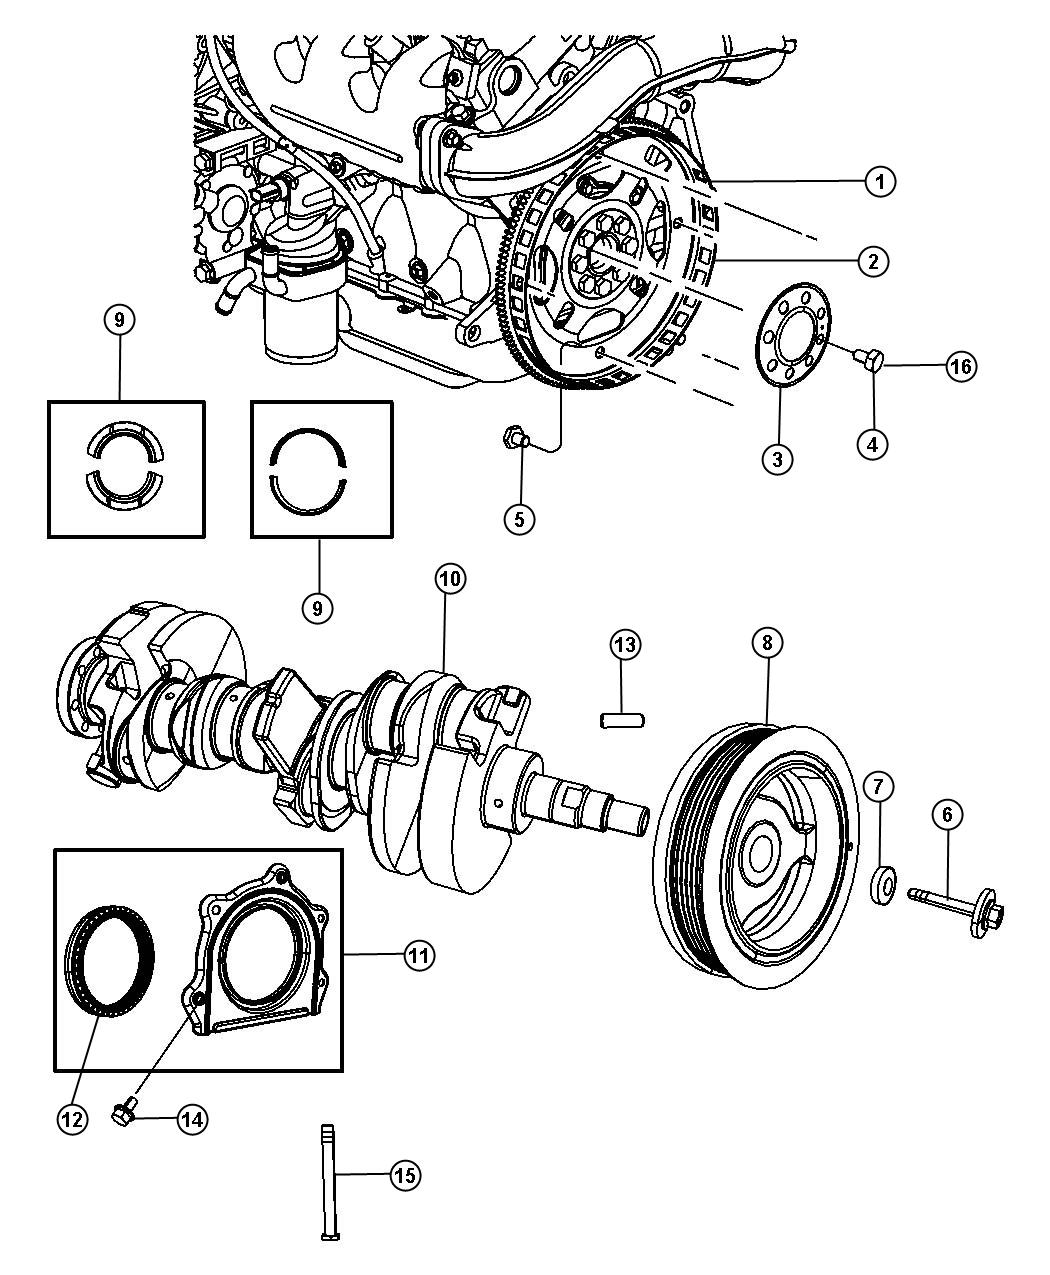 Jeep Wrangler Crankshaft Remanufactured